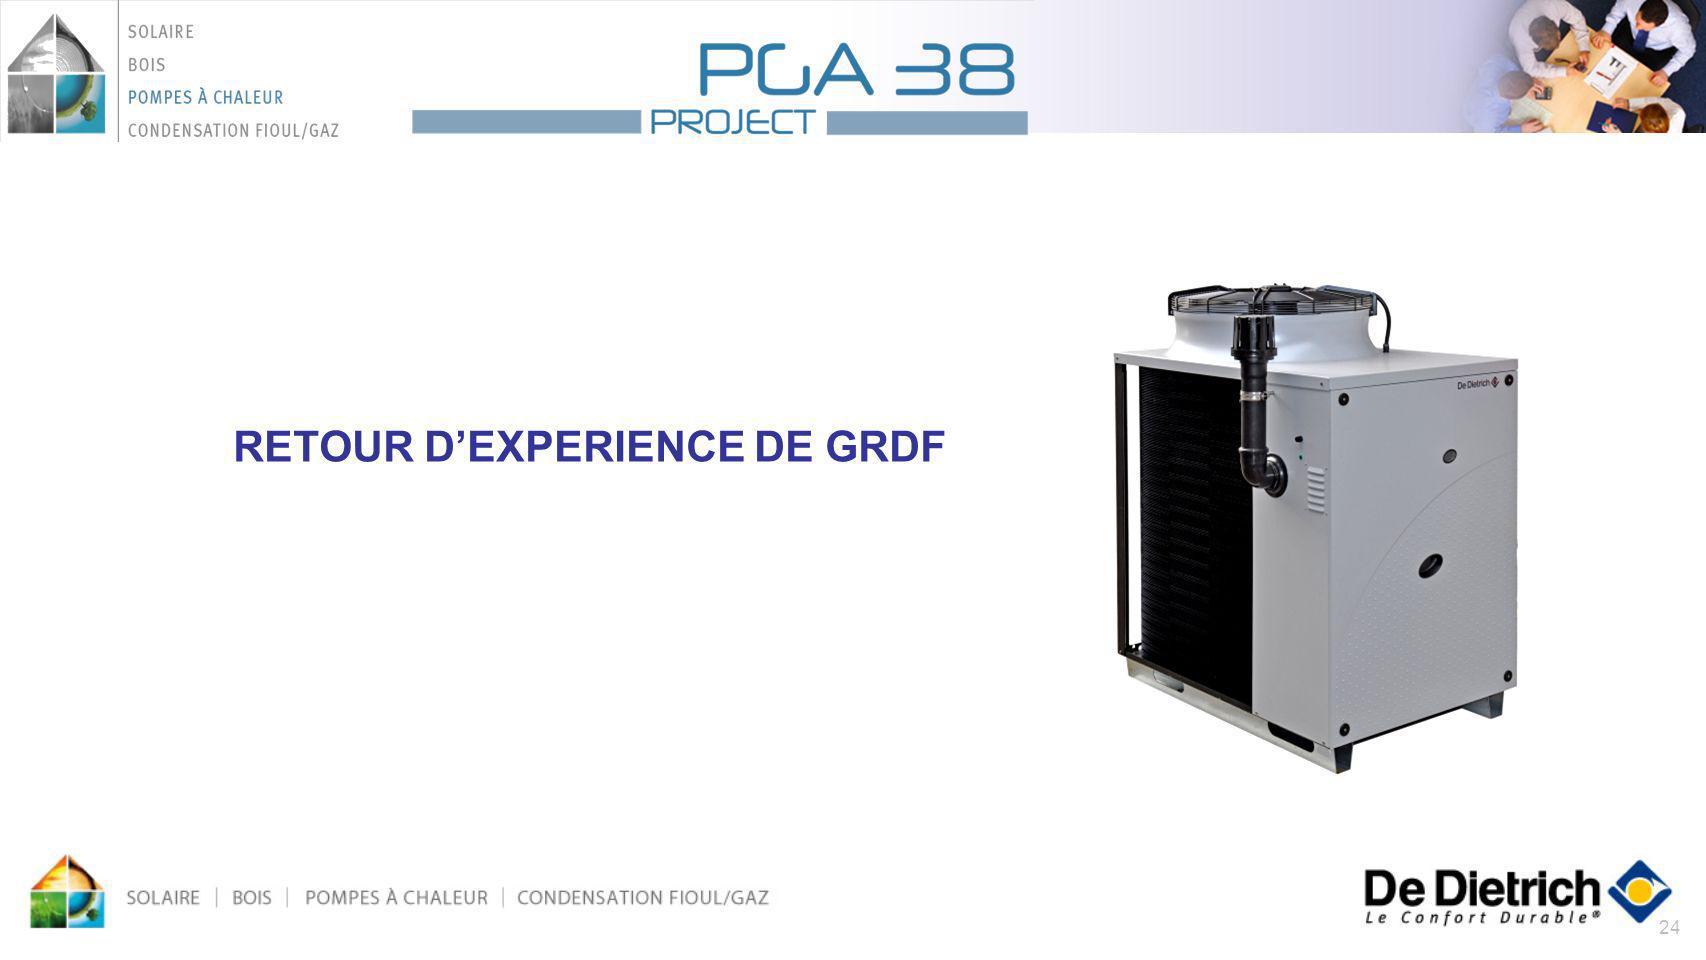 RETOUR D'EXPERIENCE DE GRDF